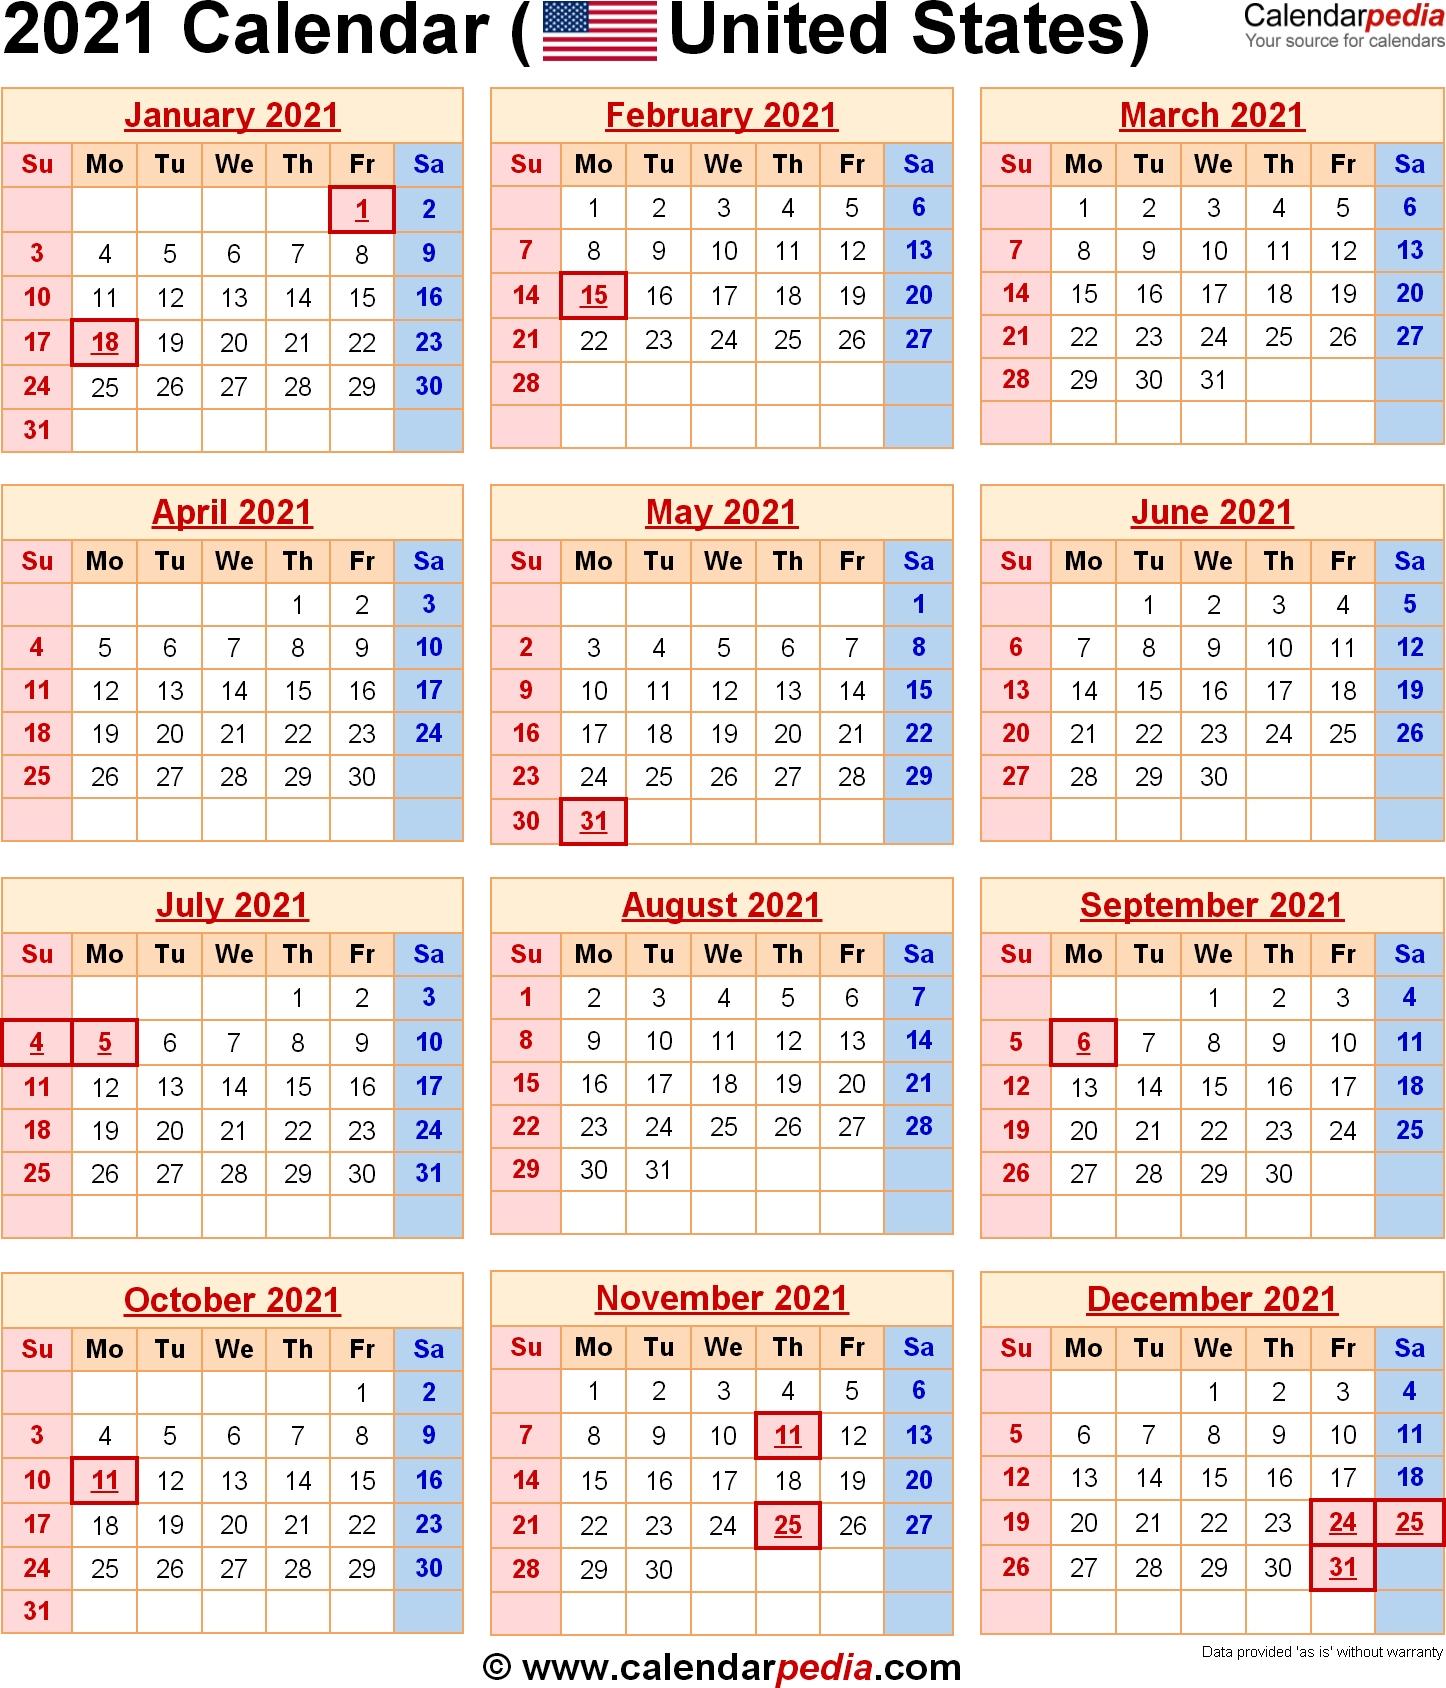 Us Government Calendar 2021 Printable | Free 2021 Printable Calendars for Bangladesh 2021 Government Calendar Graphics